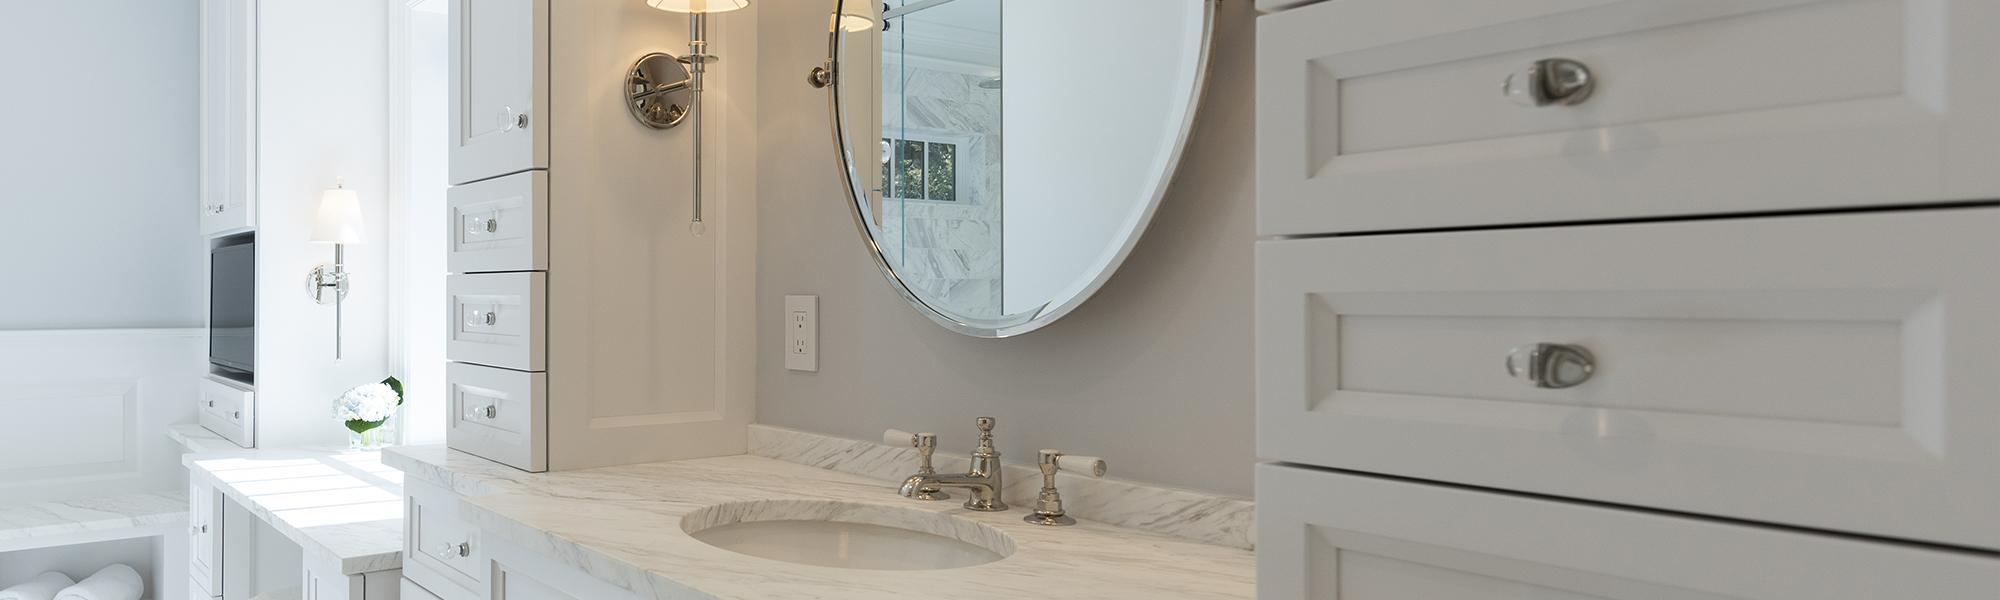 Contemporary Design - Kitchen - Bathroom